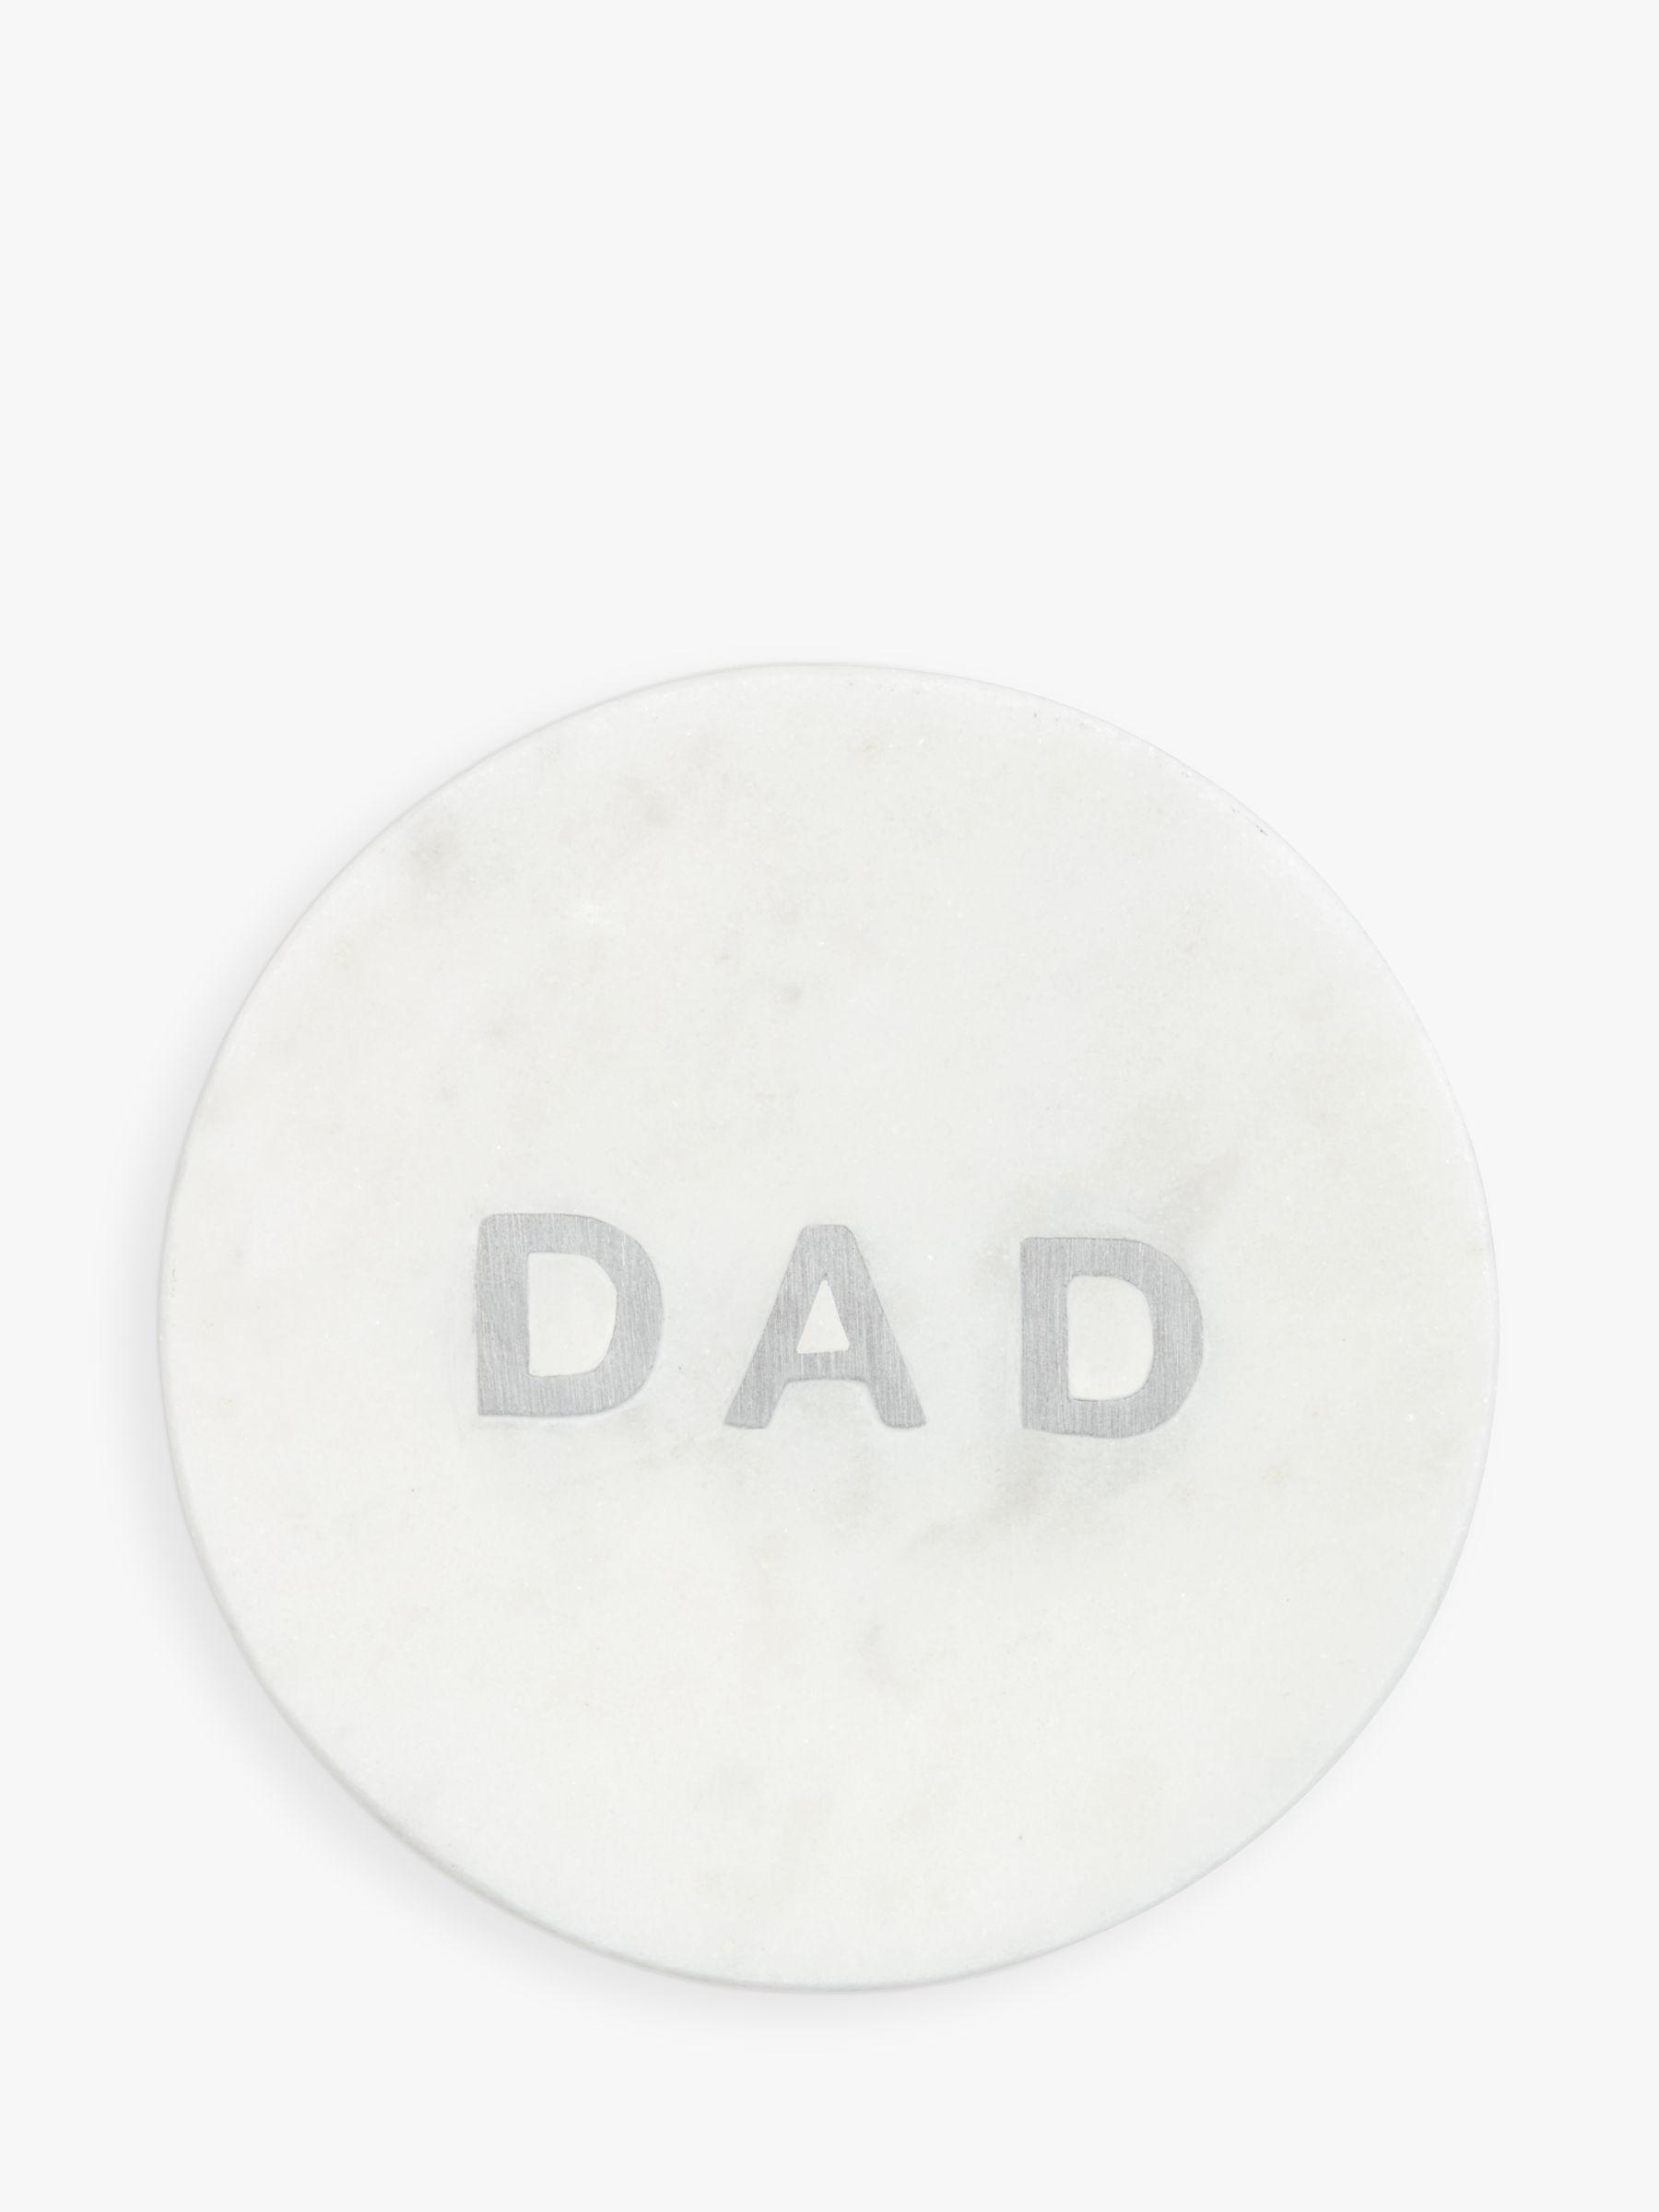 John Lewis & Partners 'Dad' Marble Coaster, White/Silver